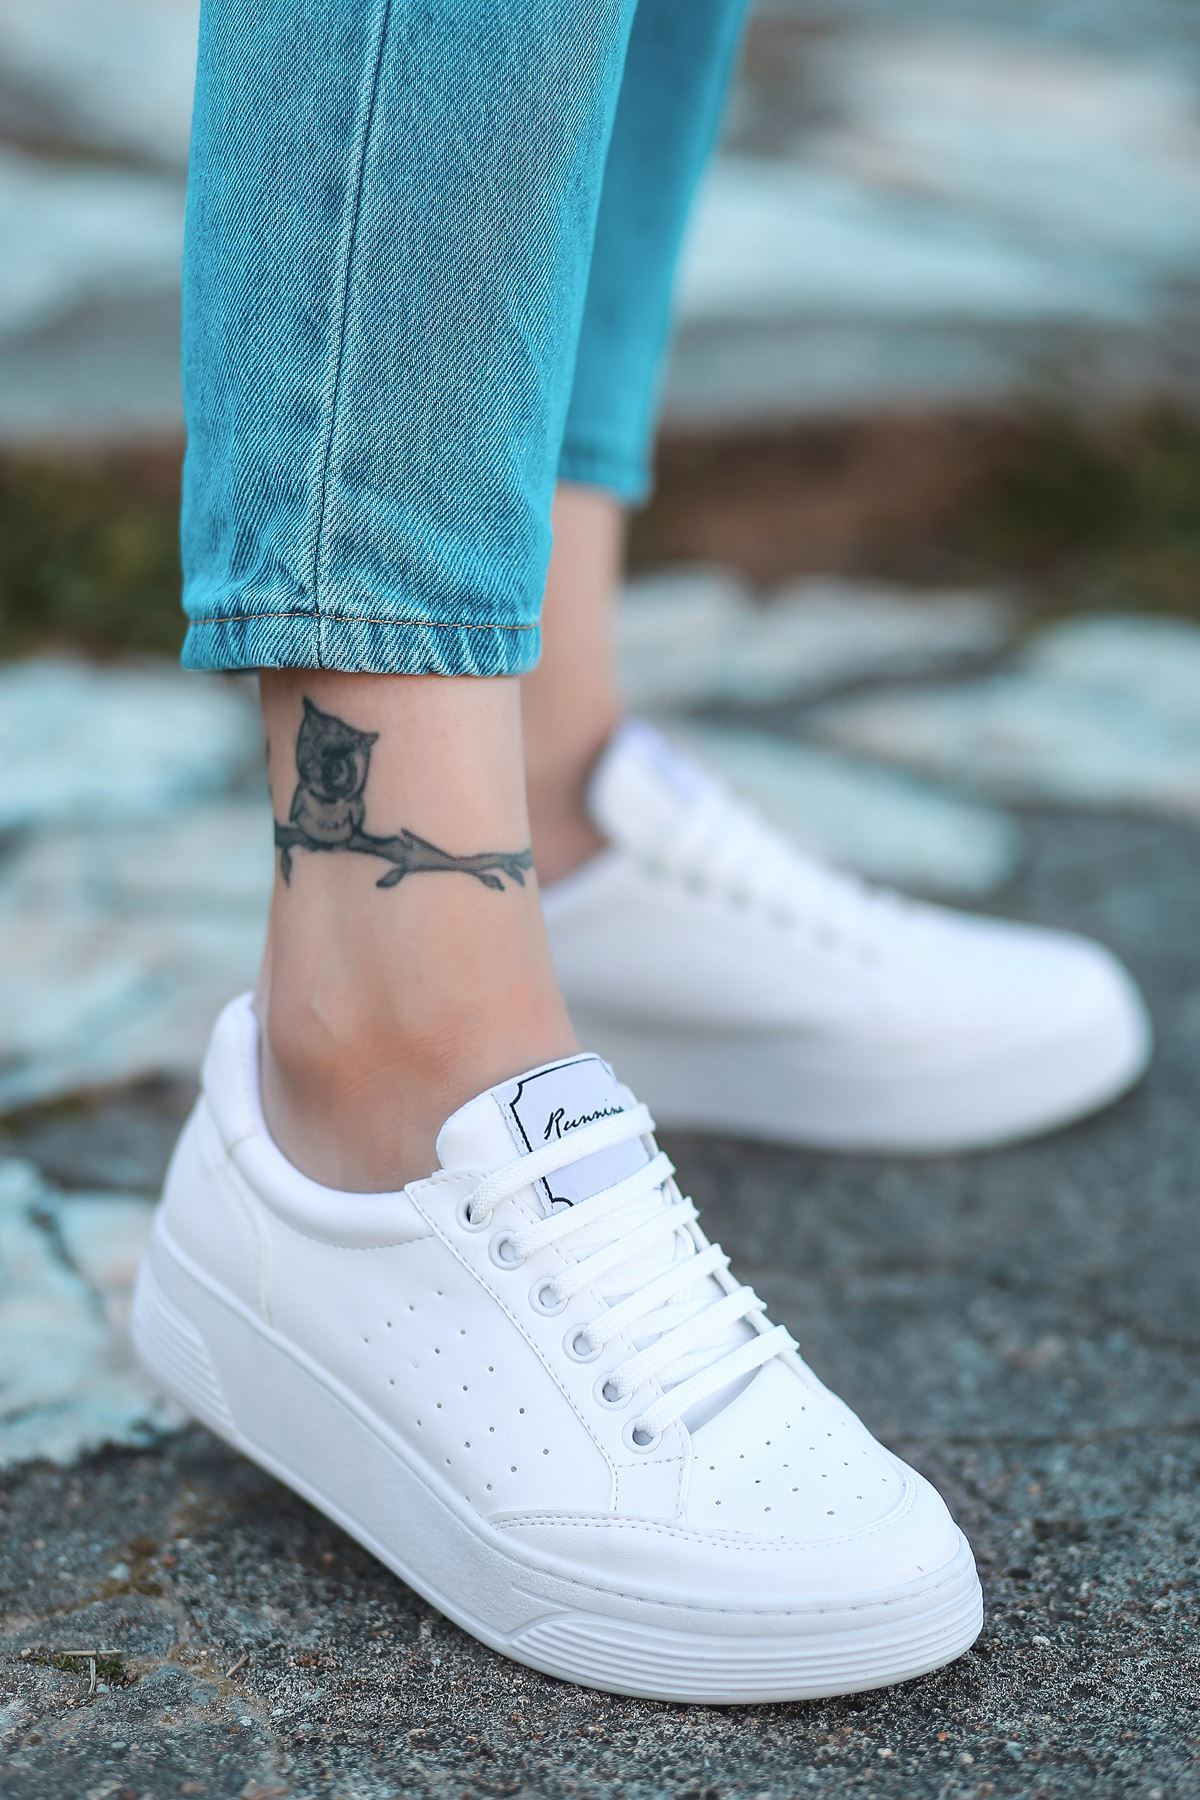 Fuzzy Mat Deri Beyaz Taban Bağcık Detay Beyaz Sneakers